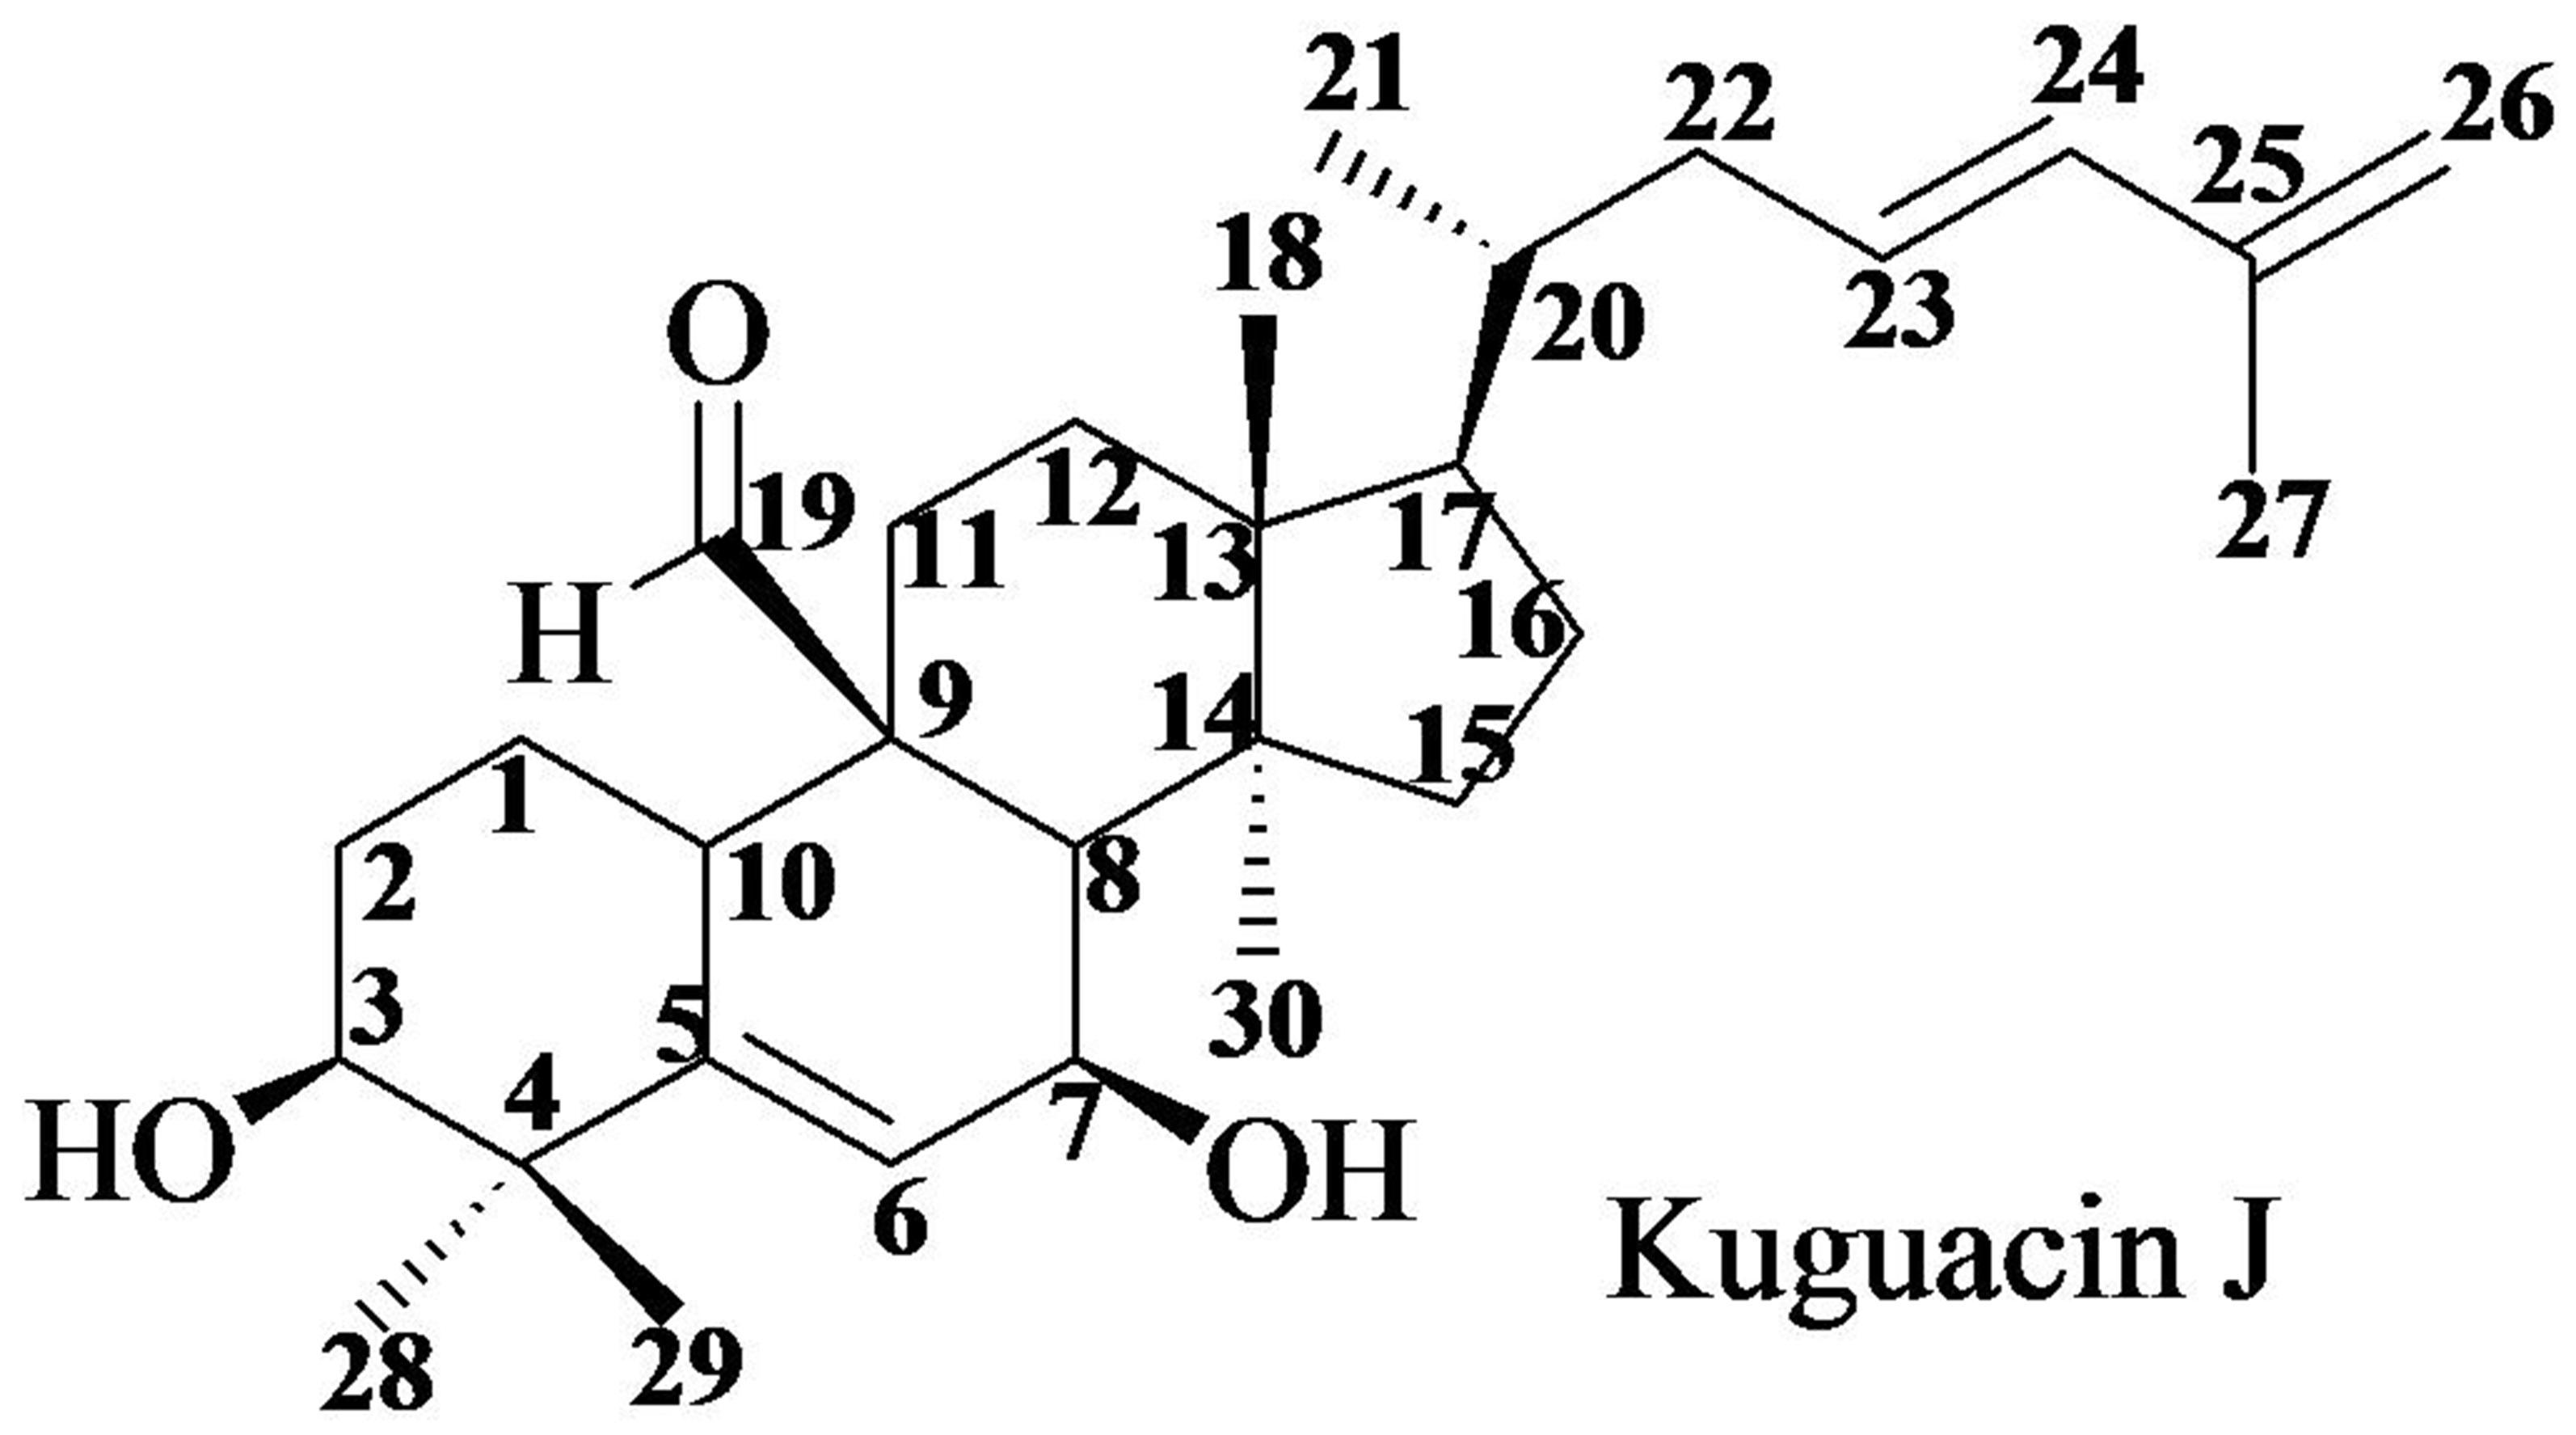 Kuguacin J, a Triterpenoid from Momordica charantia Linn